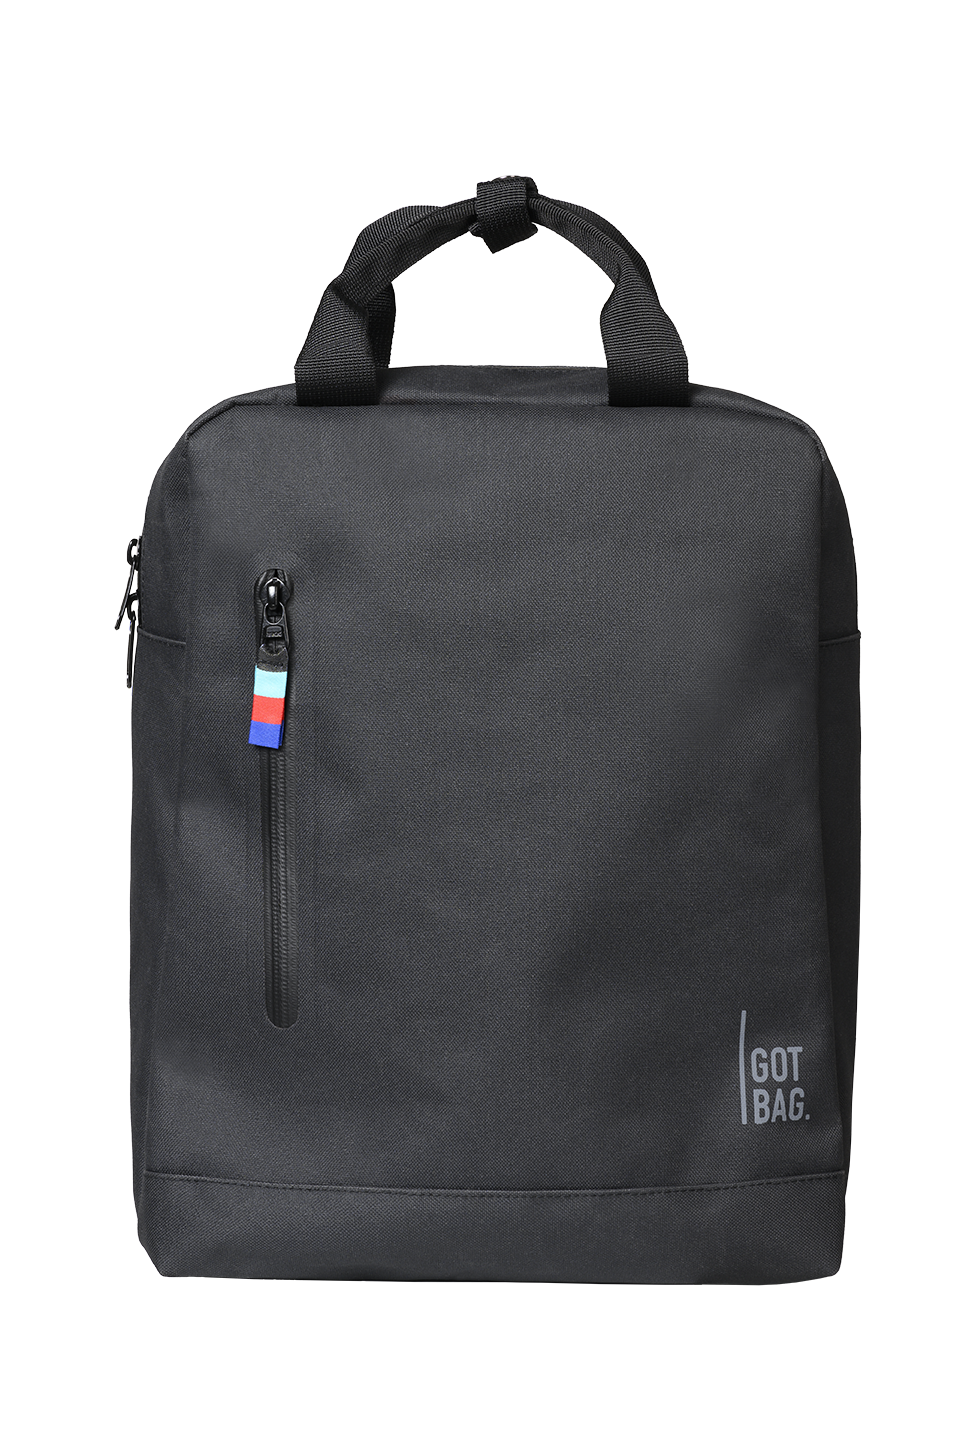 got-bag デイバッグ